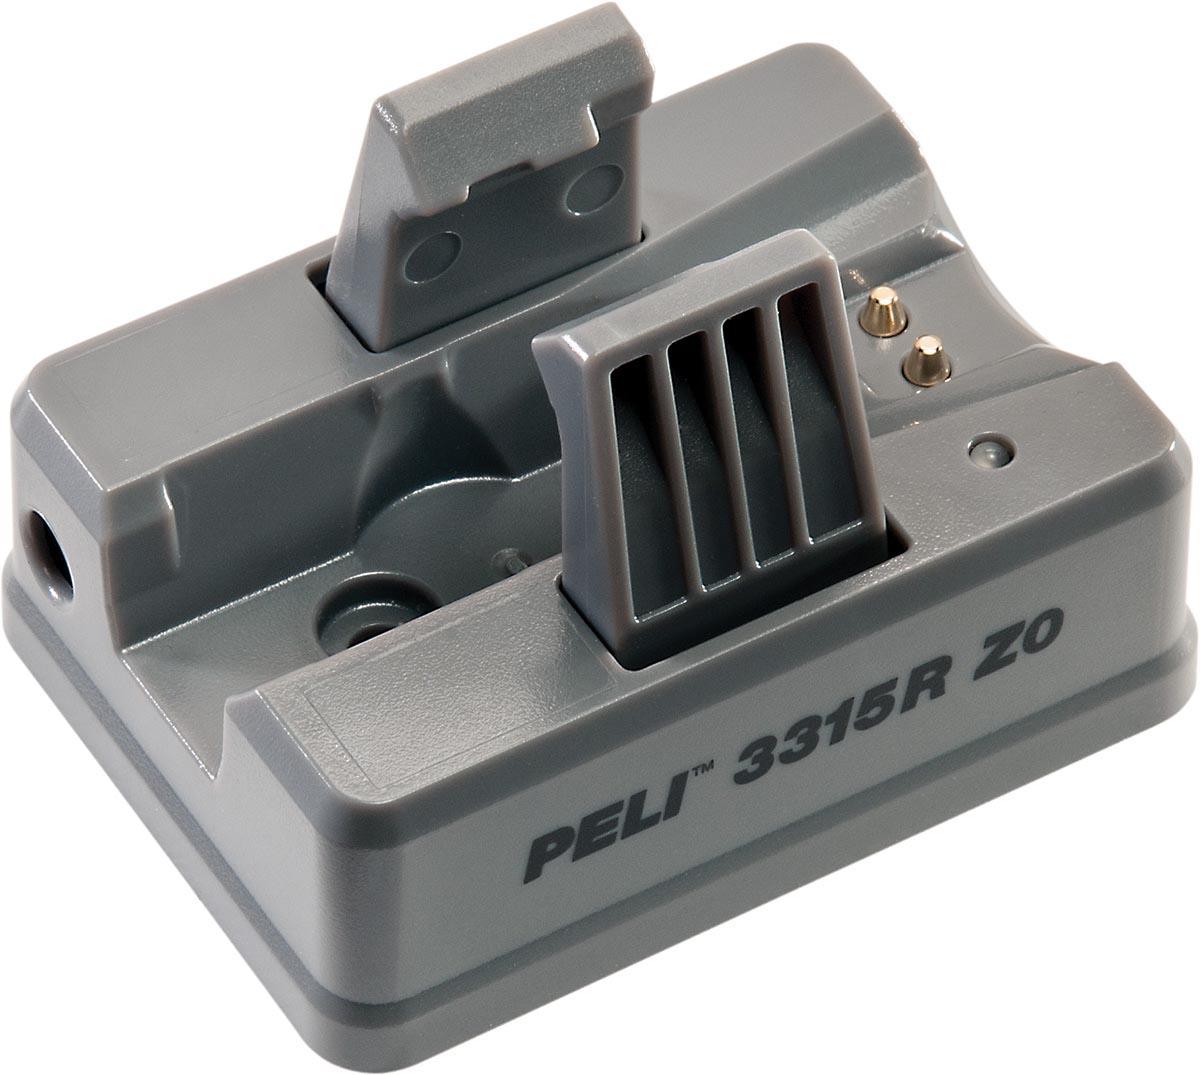 peli 3318z0 flashlight charger base